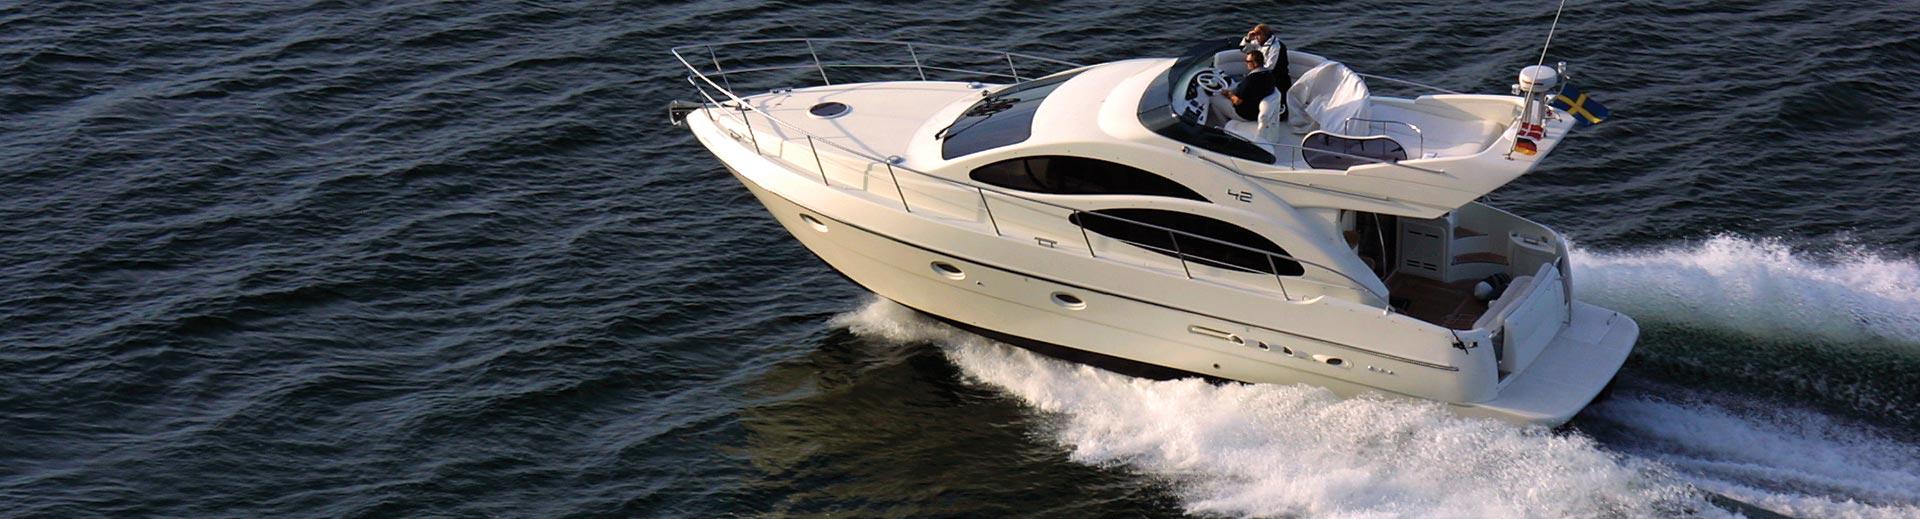 Ezi Boat Finance, Marine Loans